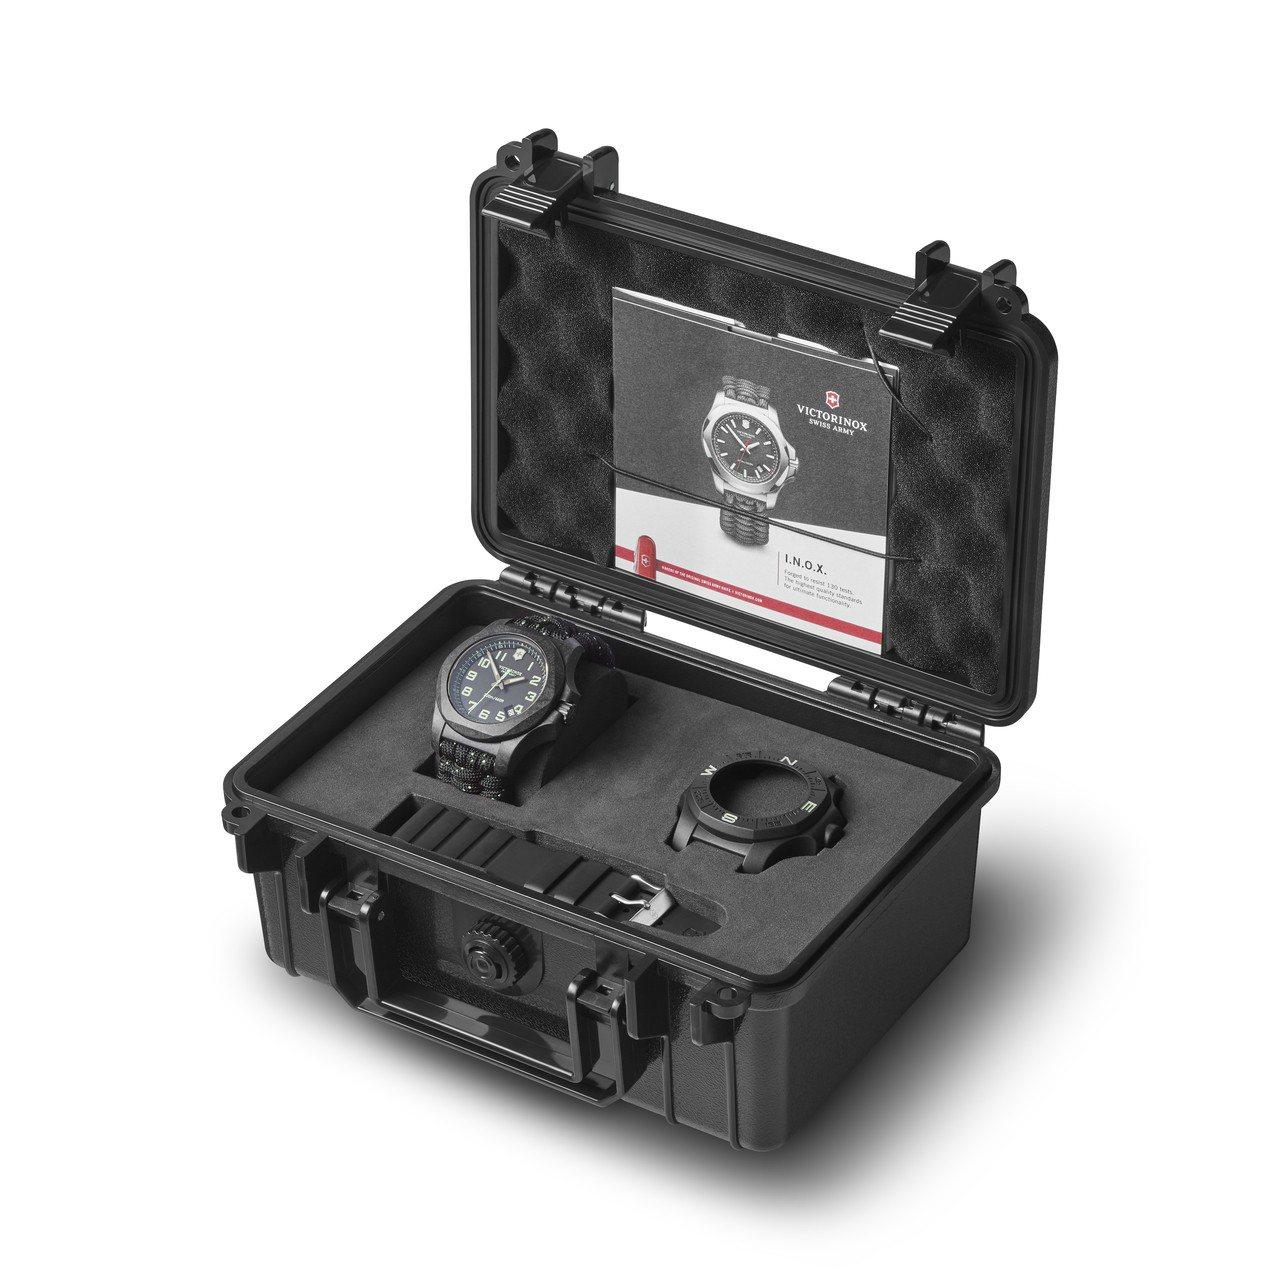 I.N.O.X. Carbon 43毫米碳纖維腕表黑色款,套裝包括特設的防震包裝...